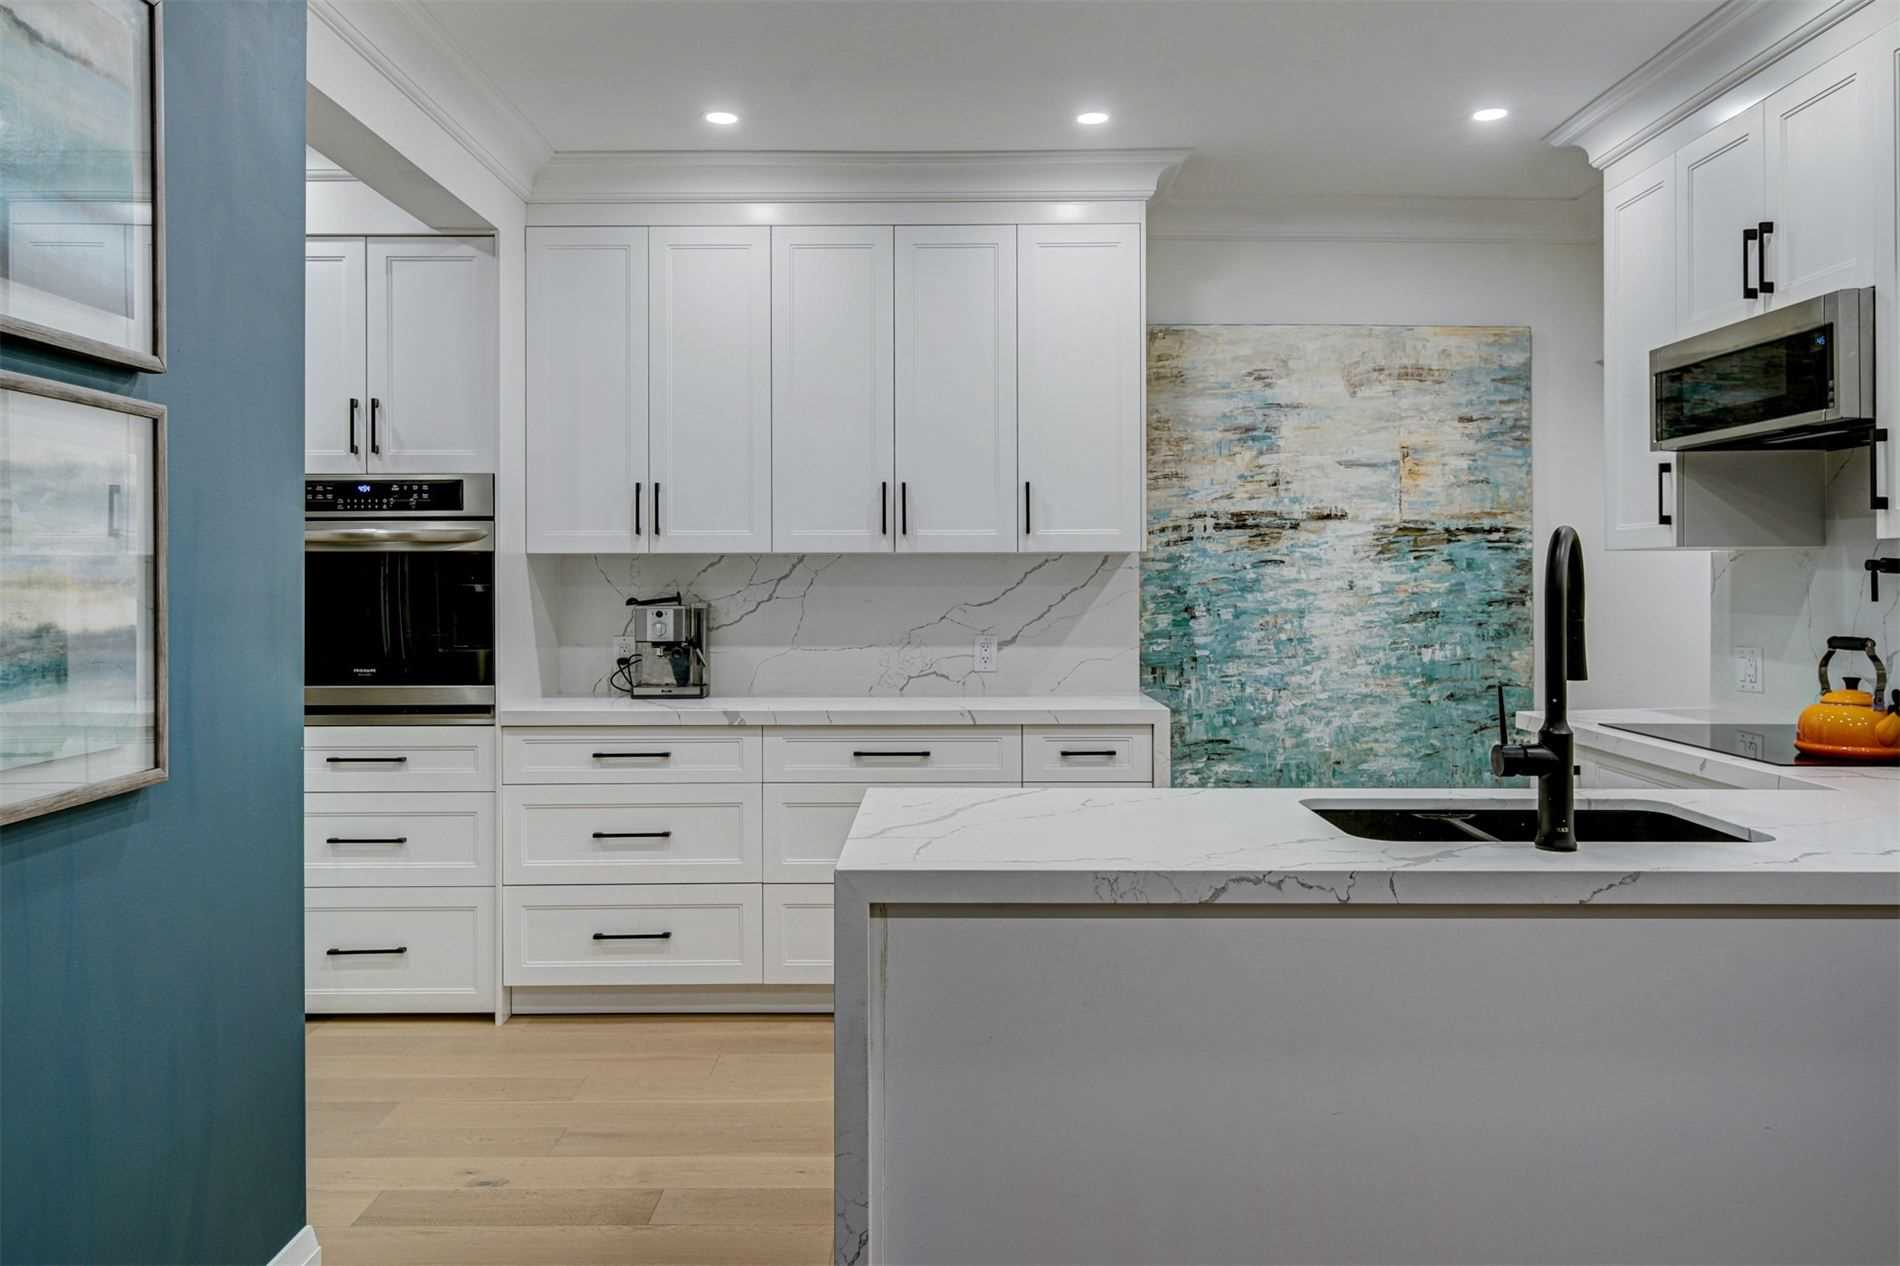 Semi-Detached For Sale In Toronto , 4 Bedrooms Bedrooms, ,3 BathroomsBathrooms,Semi-Detached,For Sale,Hogarth